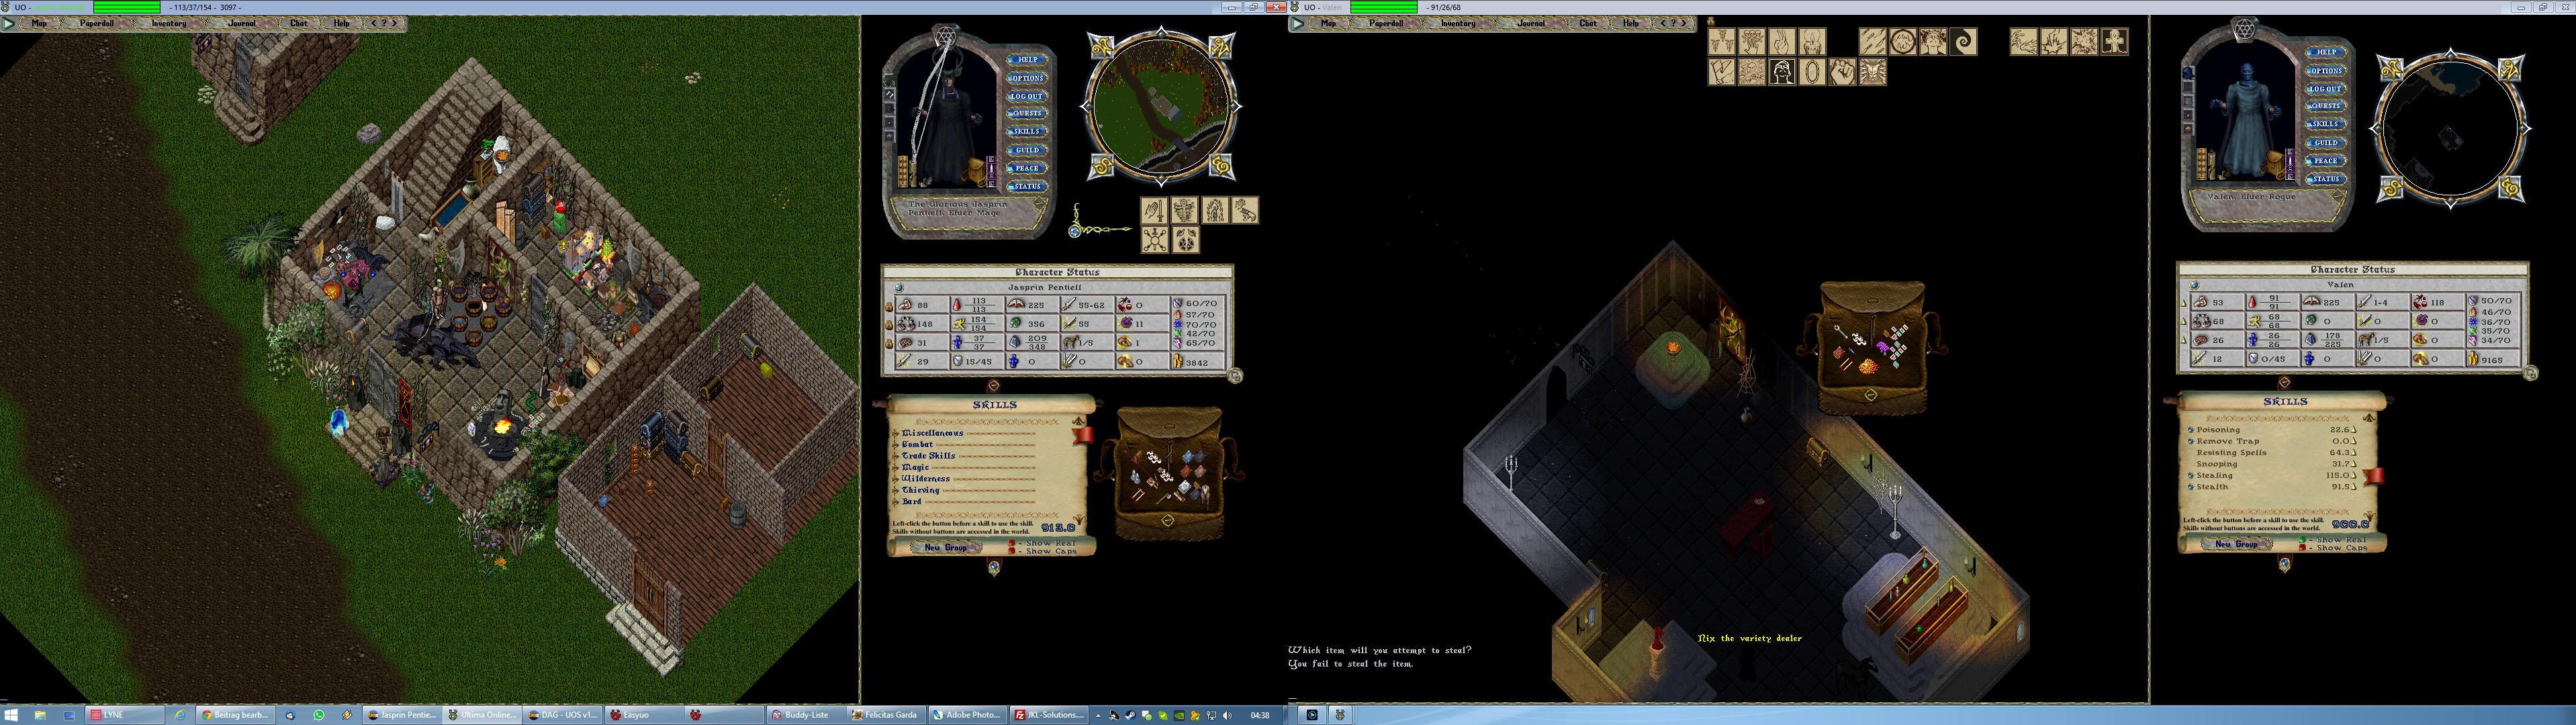 Ultima Online - Mein Haus